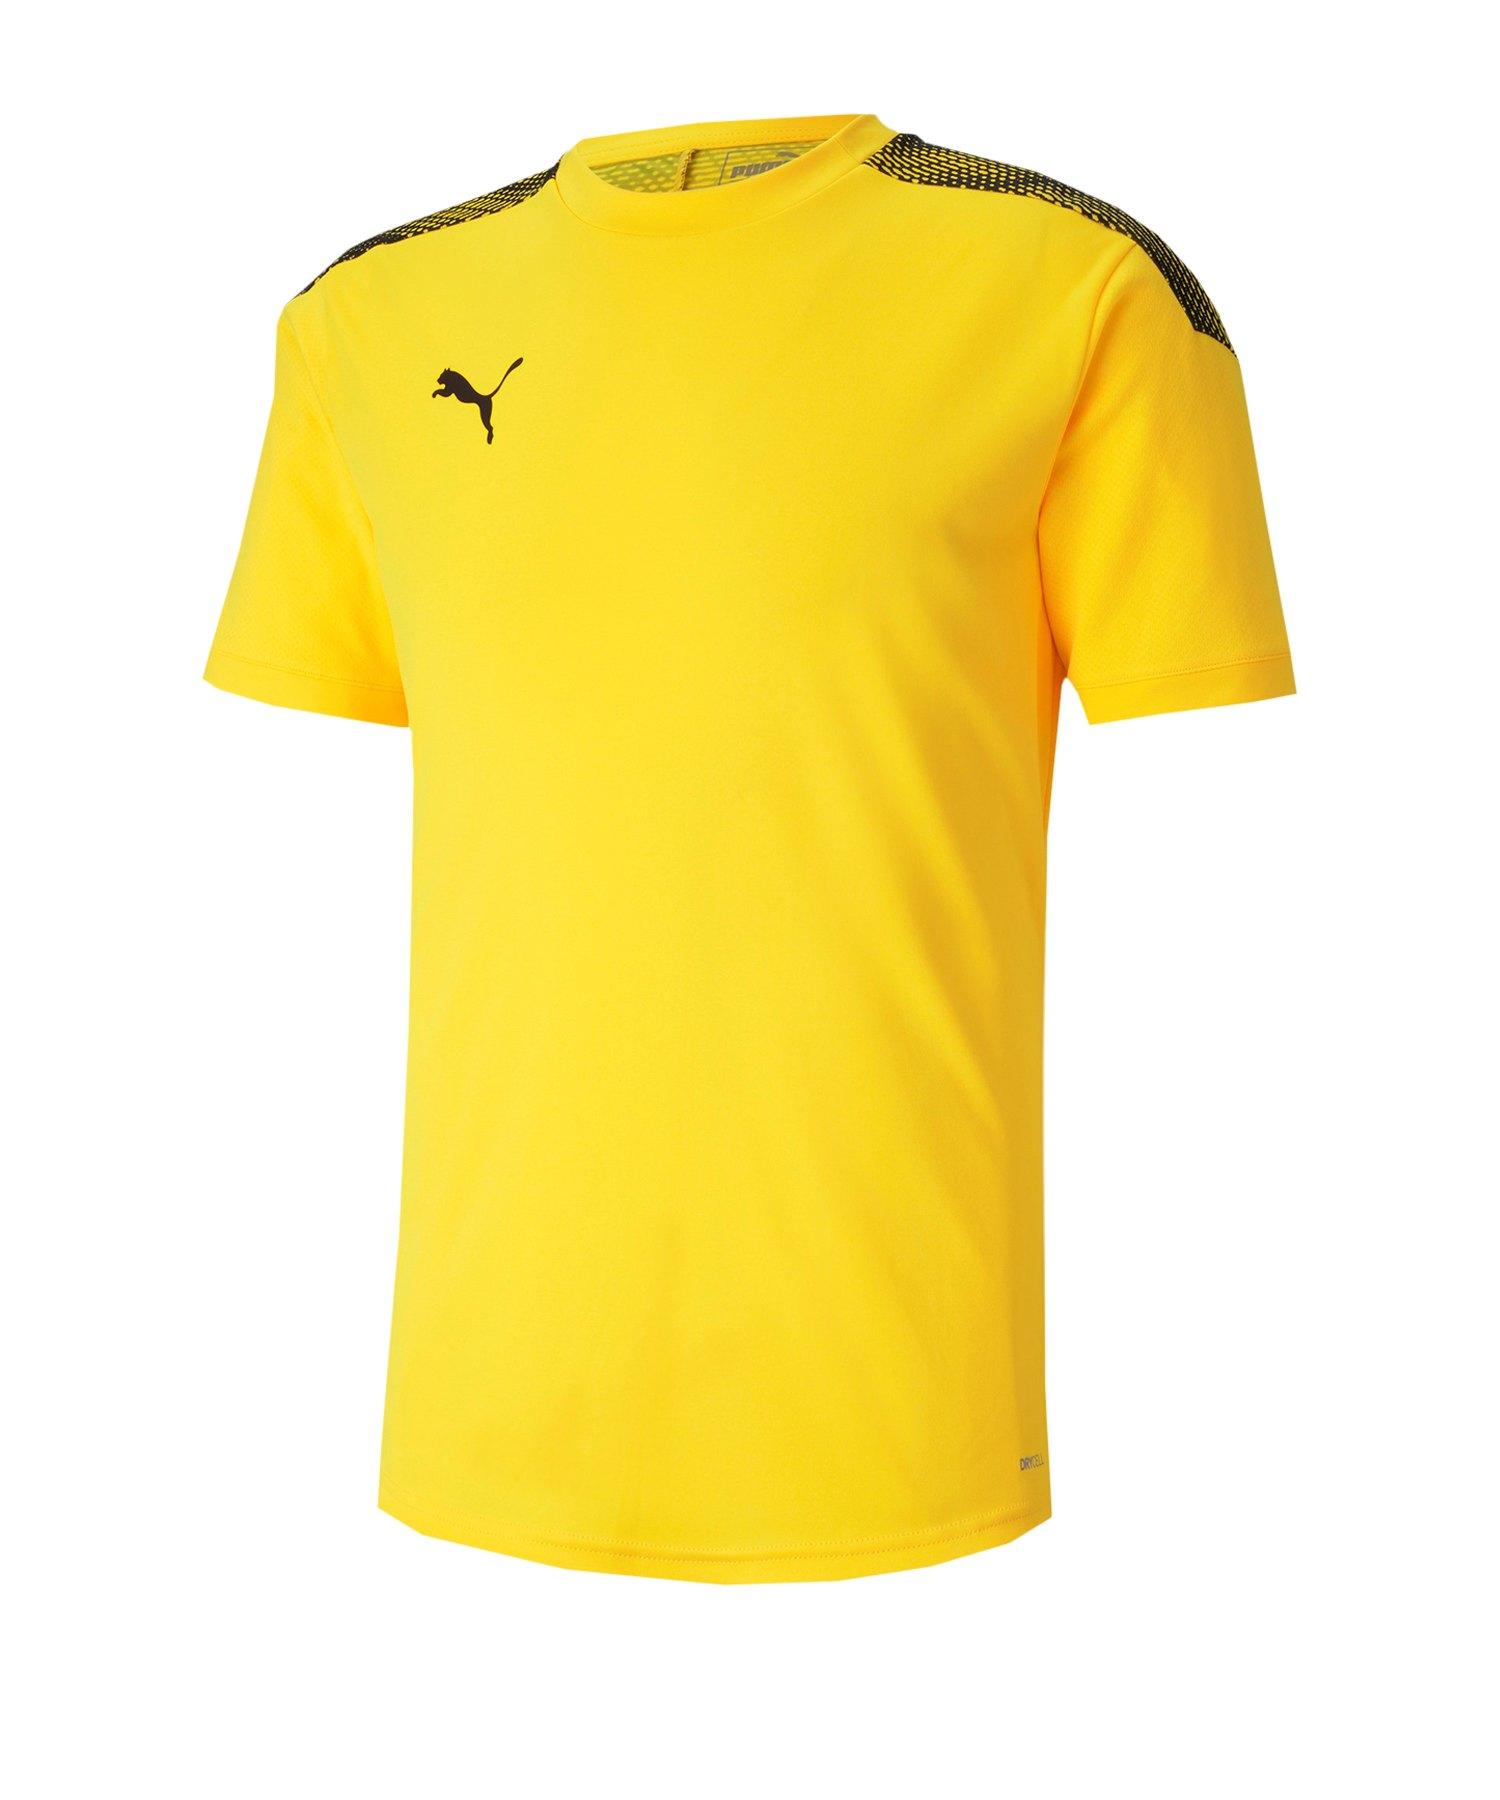 PUMA ftblNXT Pro Tee T-Shirt Gelb Schwarz F04 - gelb